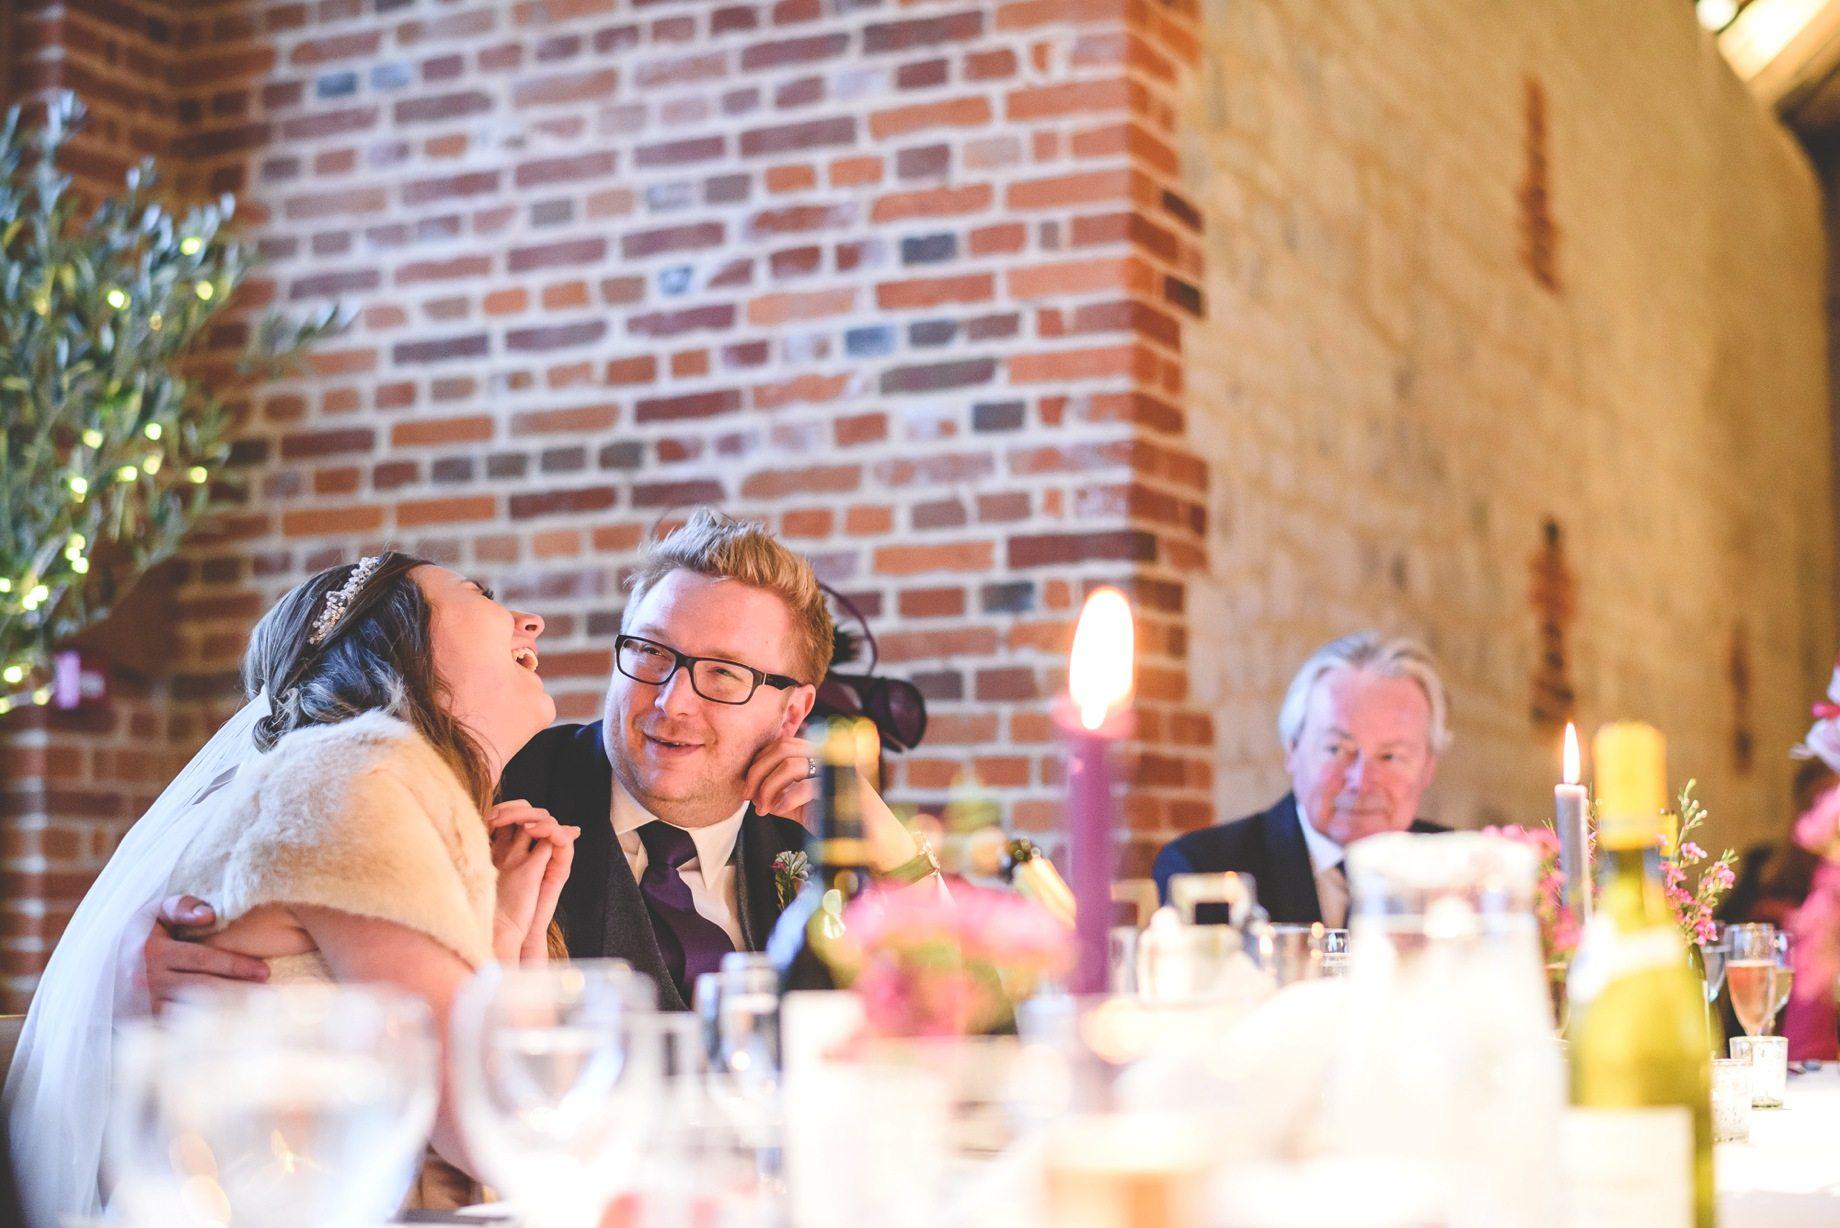 Heather and Chris - Hampshire wedding photography (142 of 174)